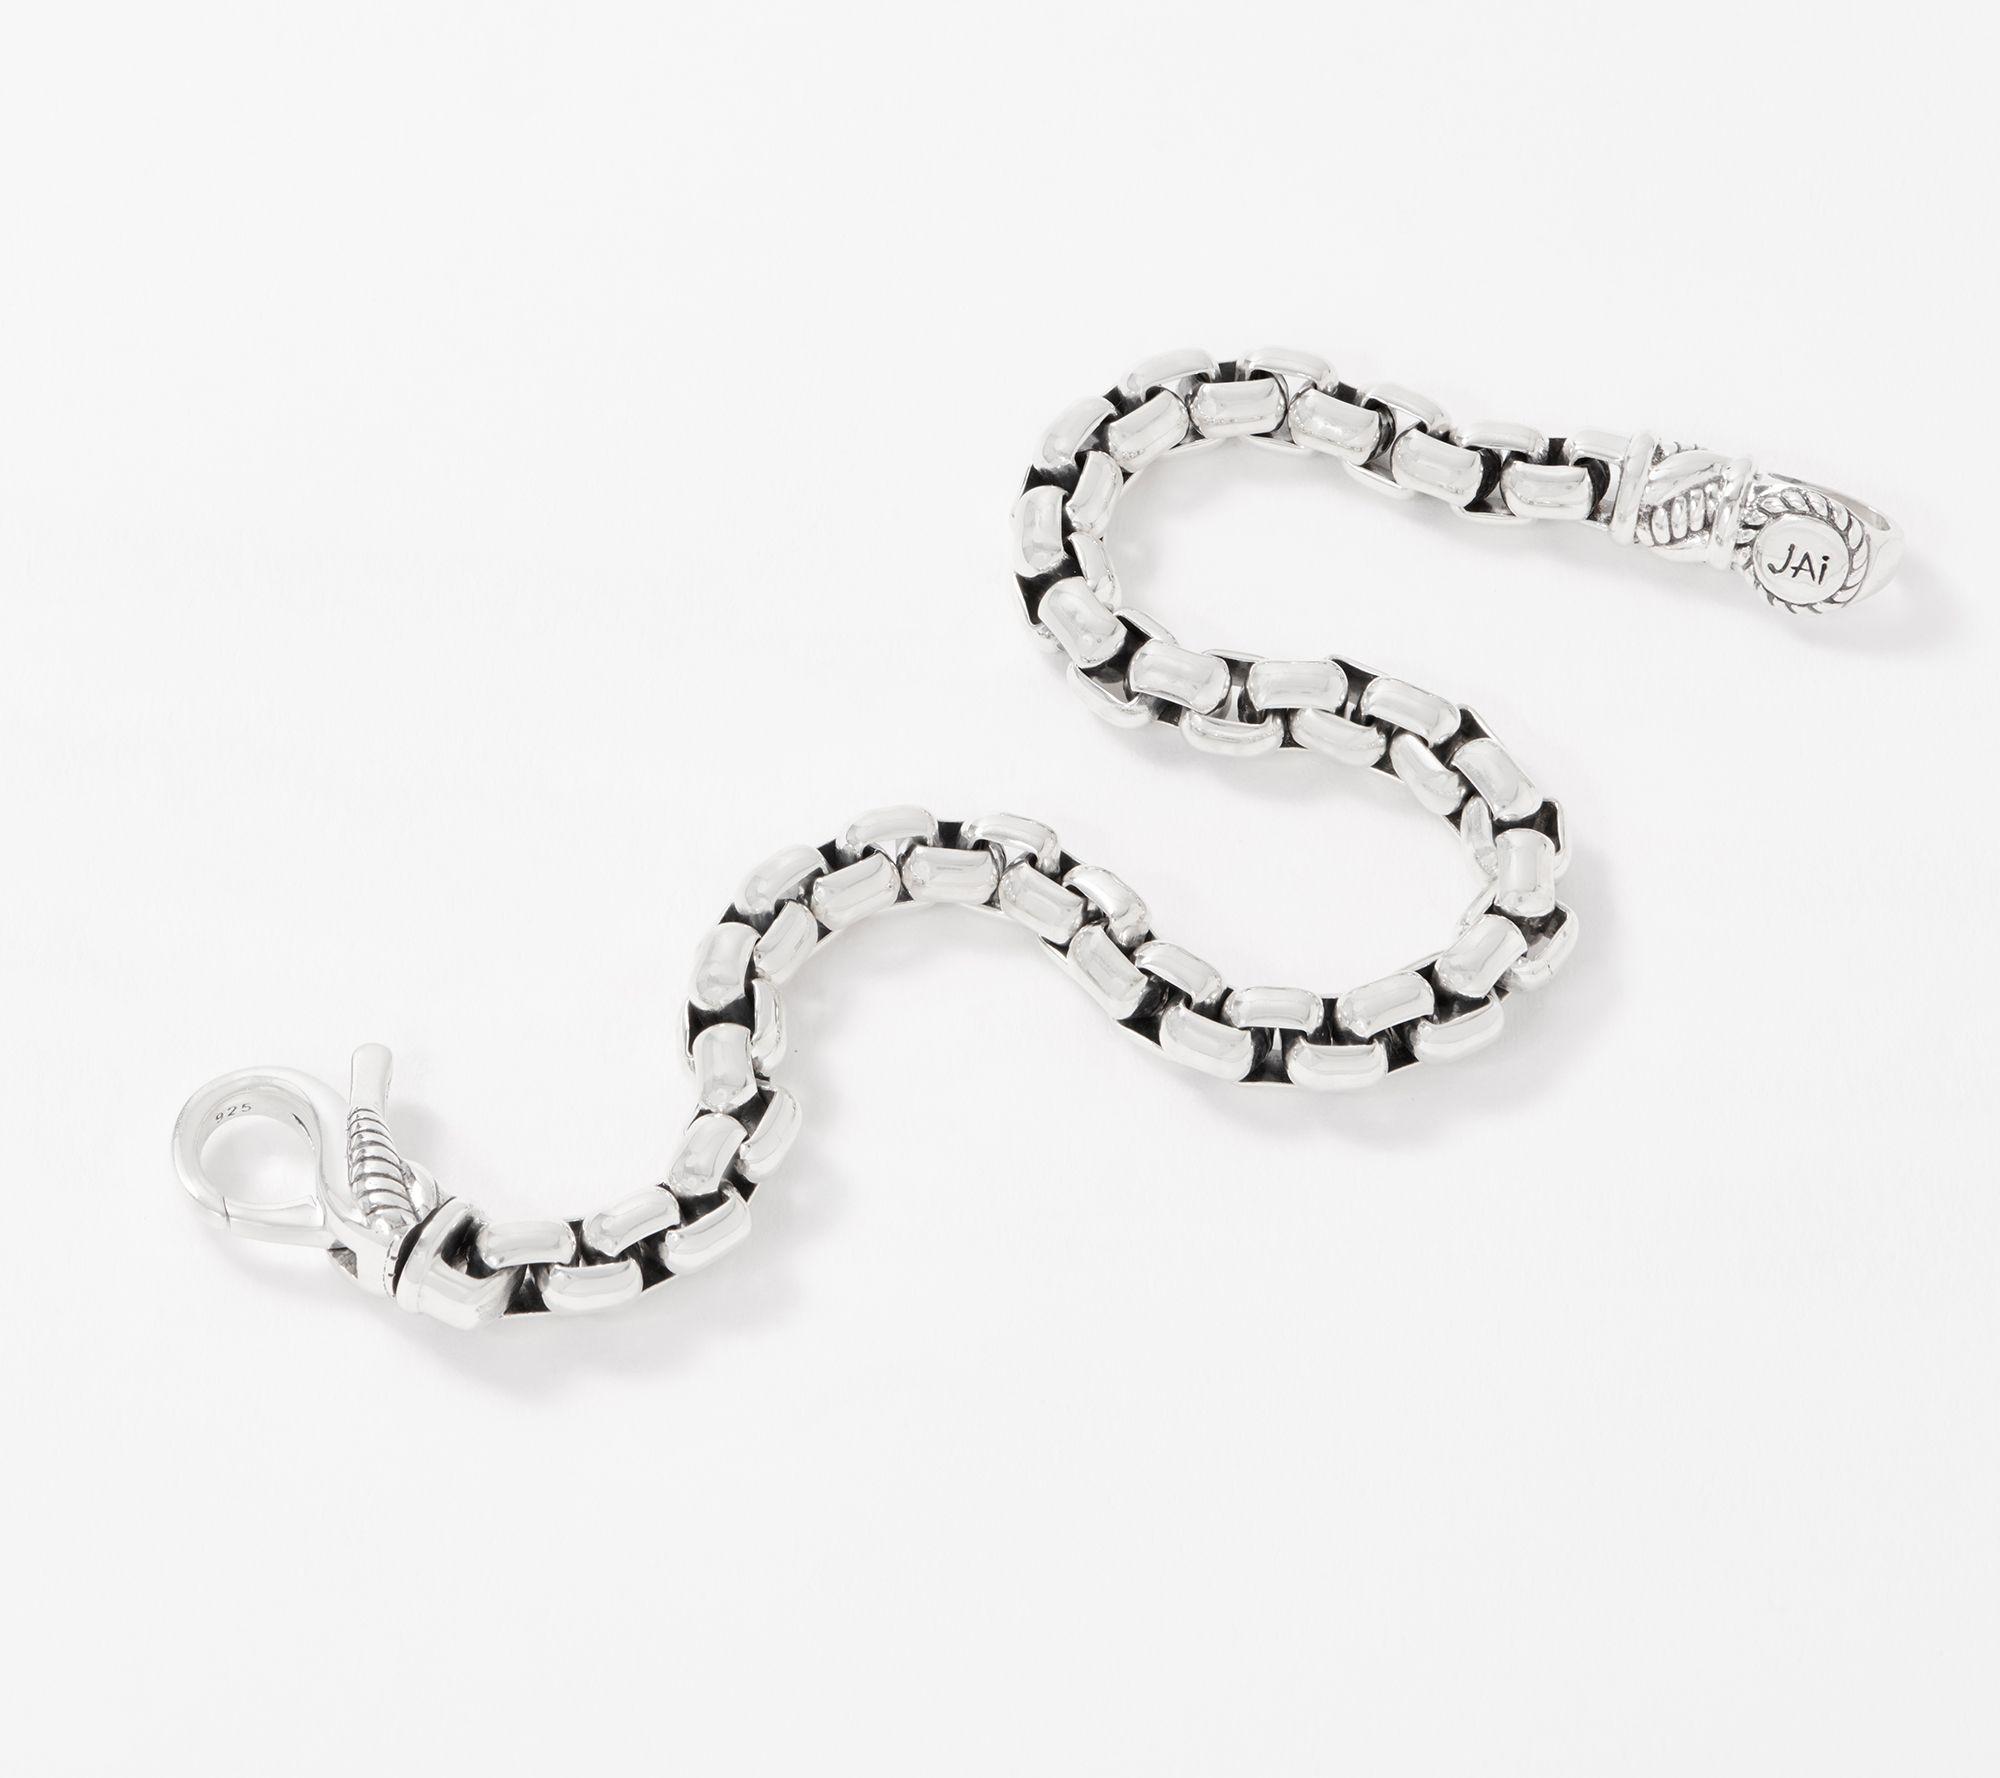 f4a5845b55e7a JAI Sterling Silver 5.3mm Round Box Chain Bracelet